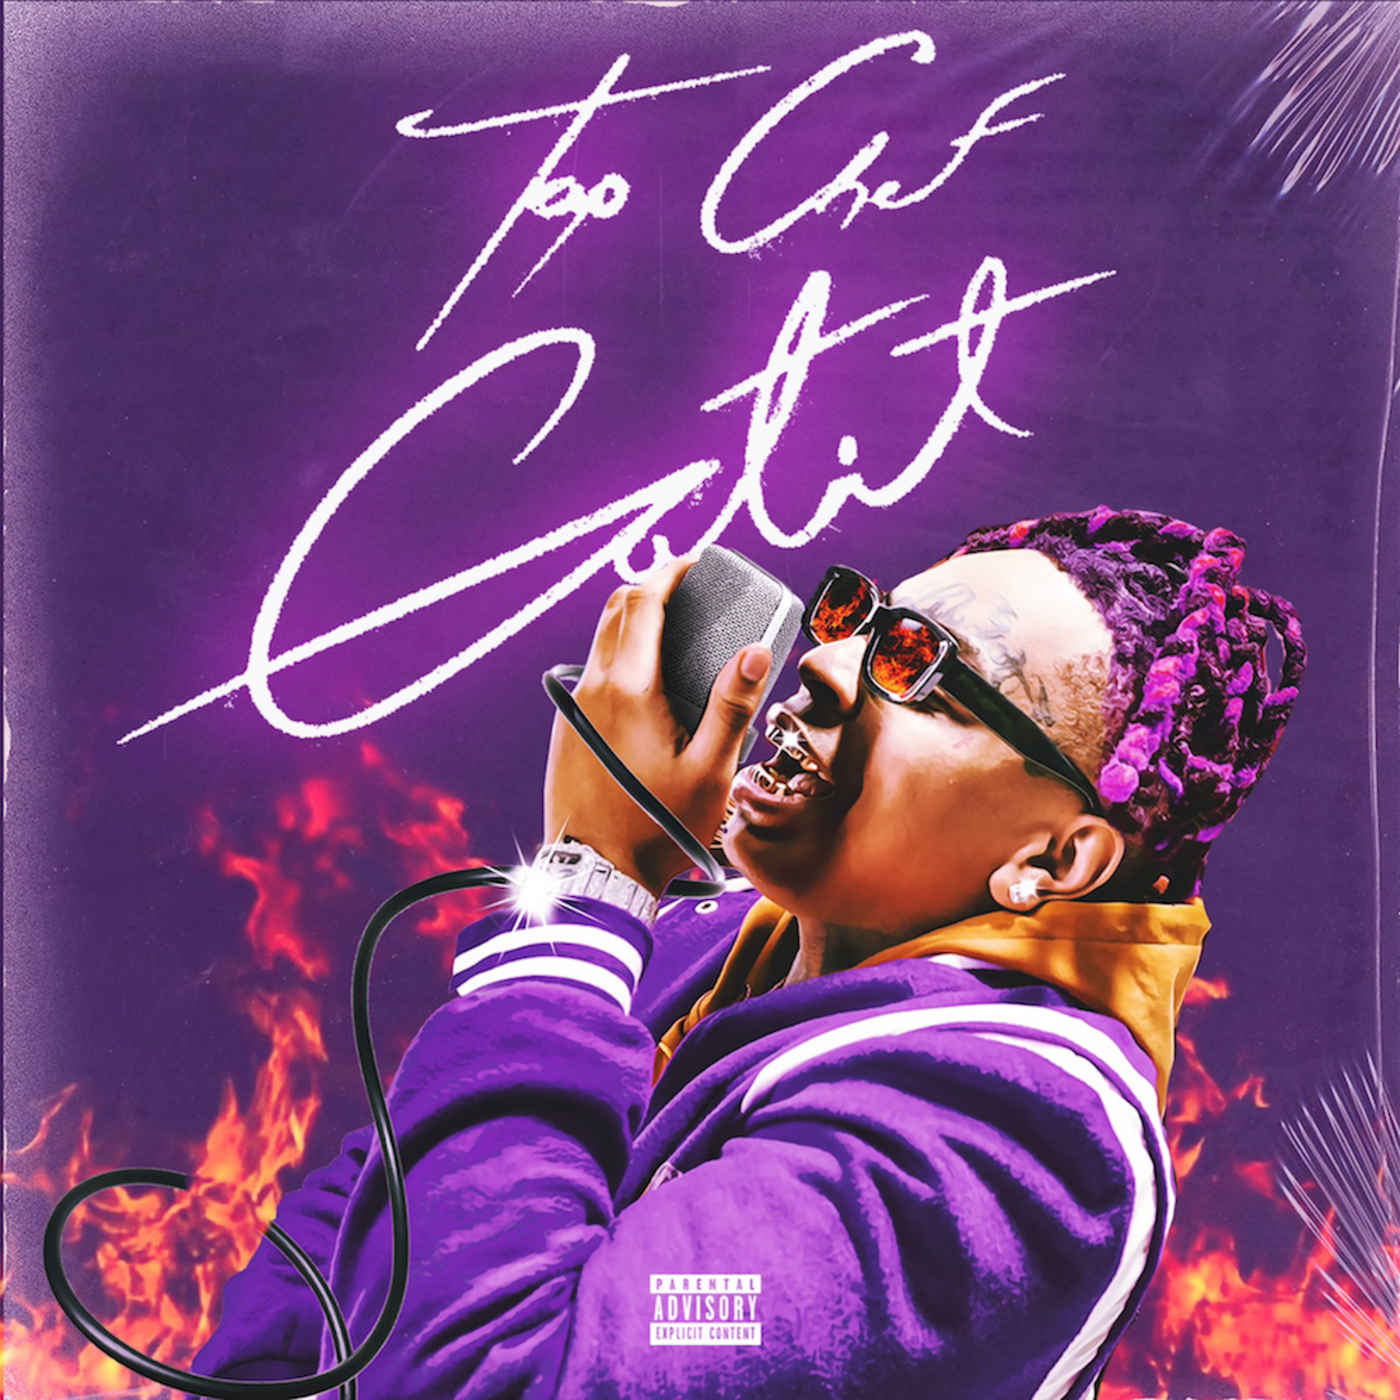 Lil Gotit — 'Top Chef Gotit'